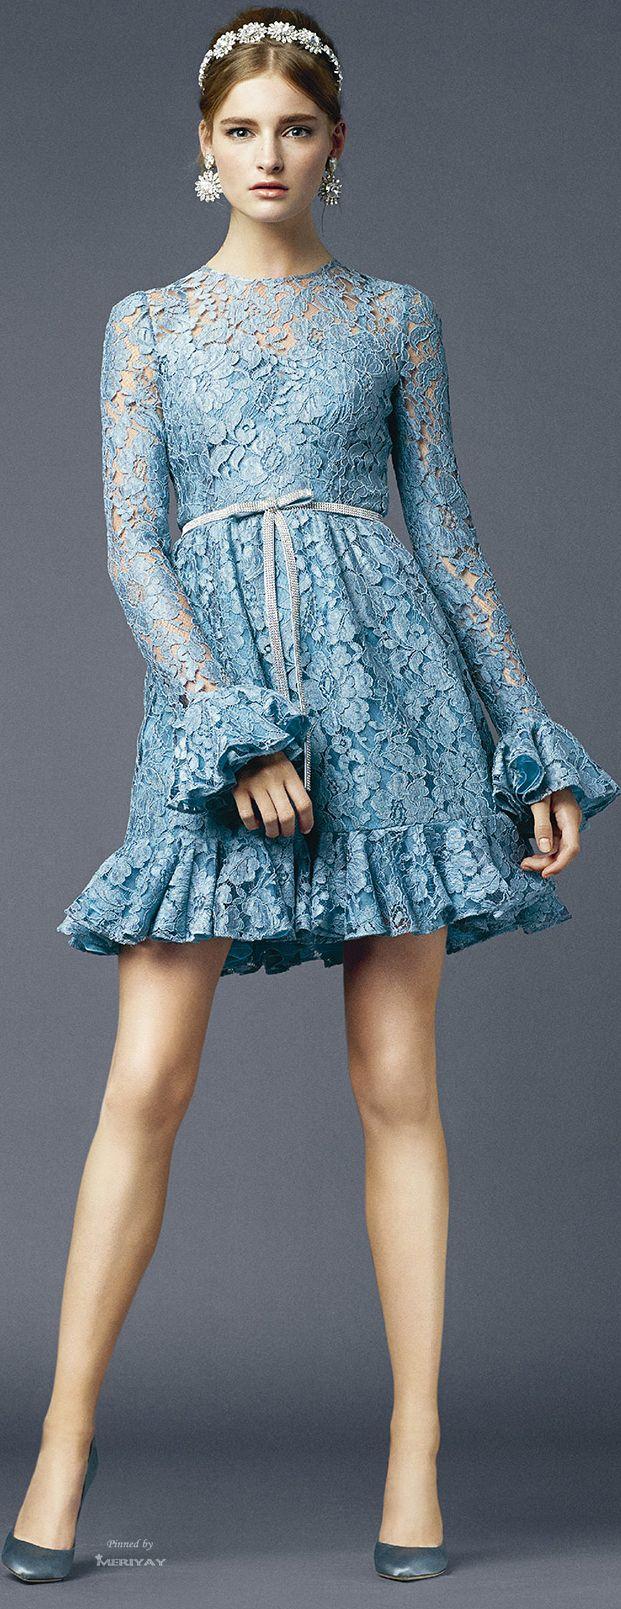 Dolce and Gabbana ss 2014.